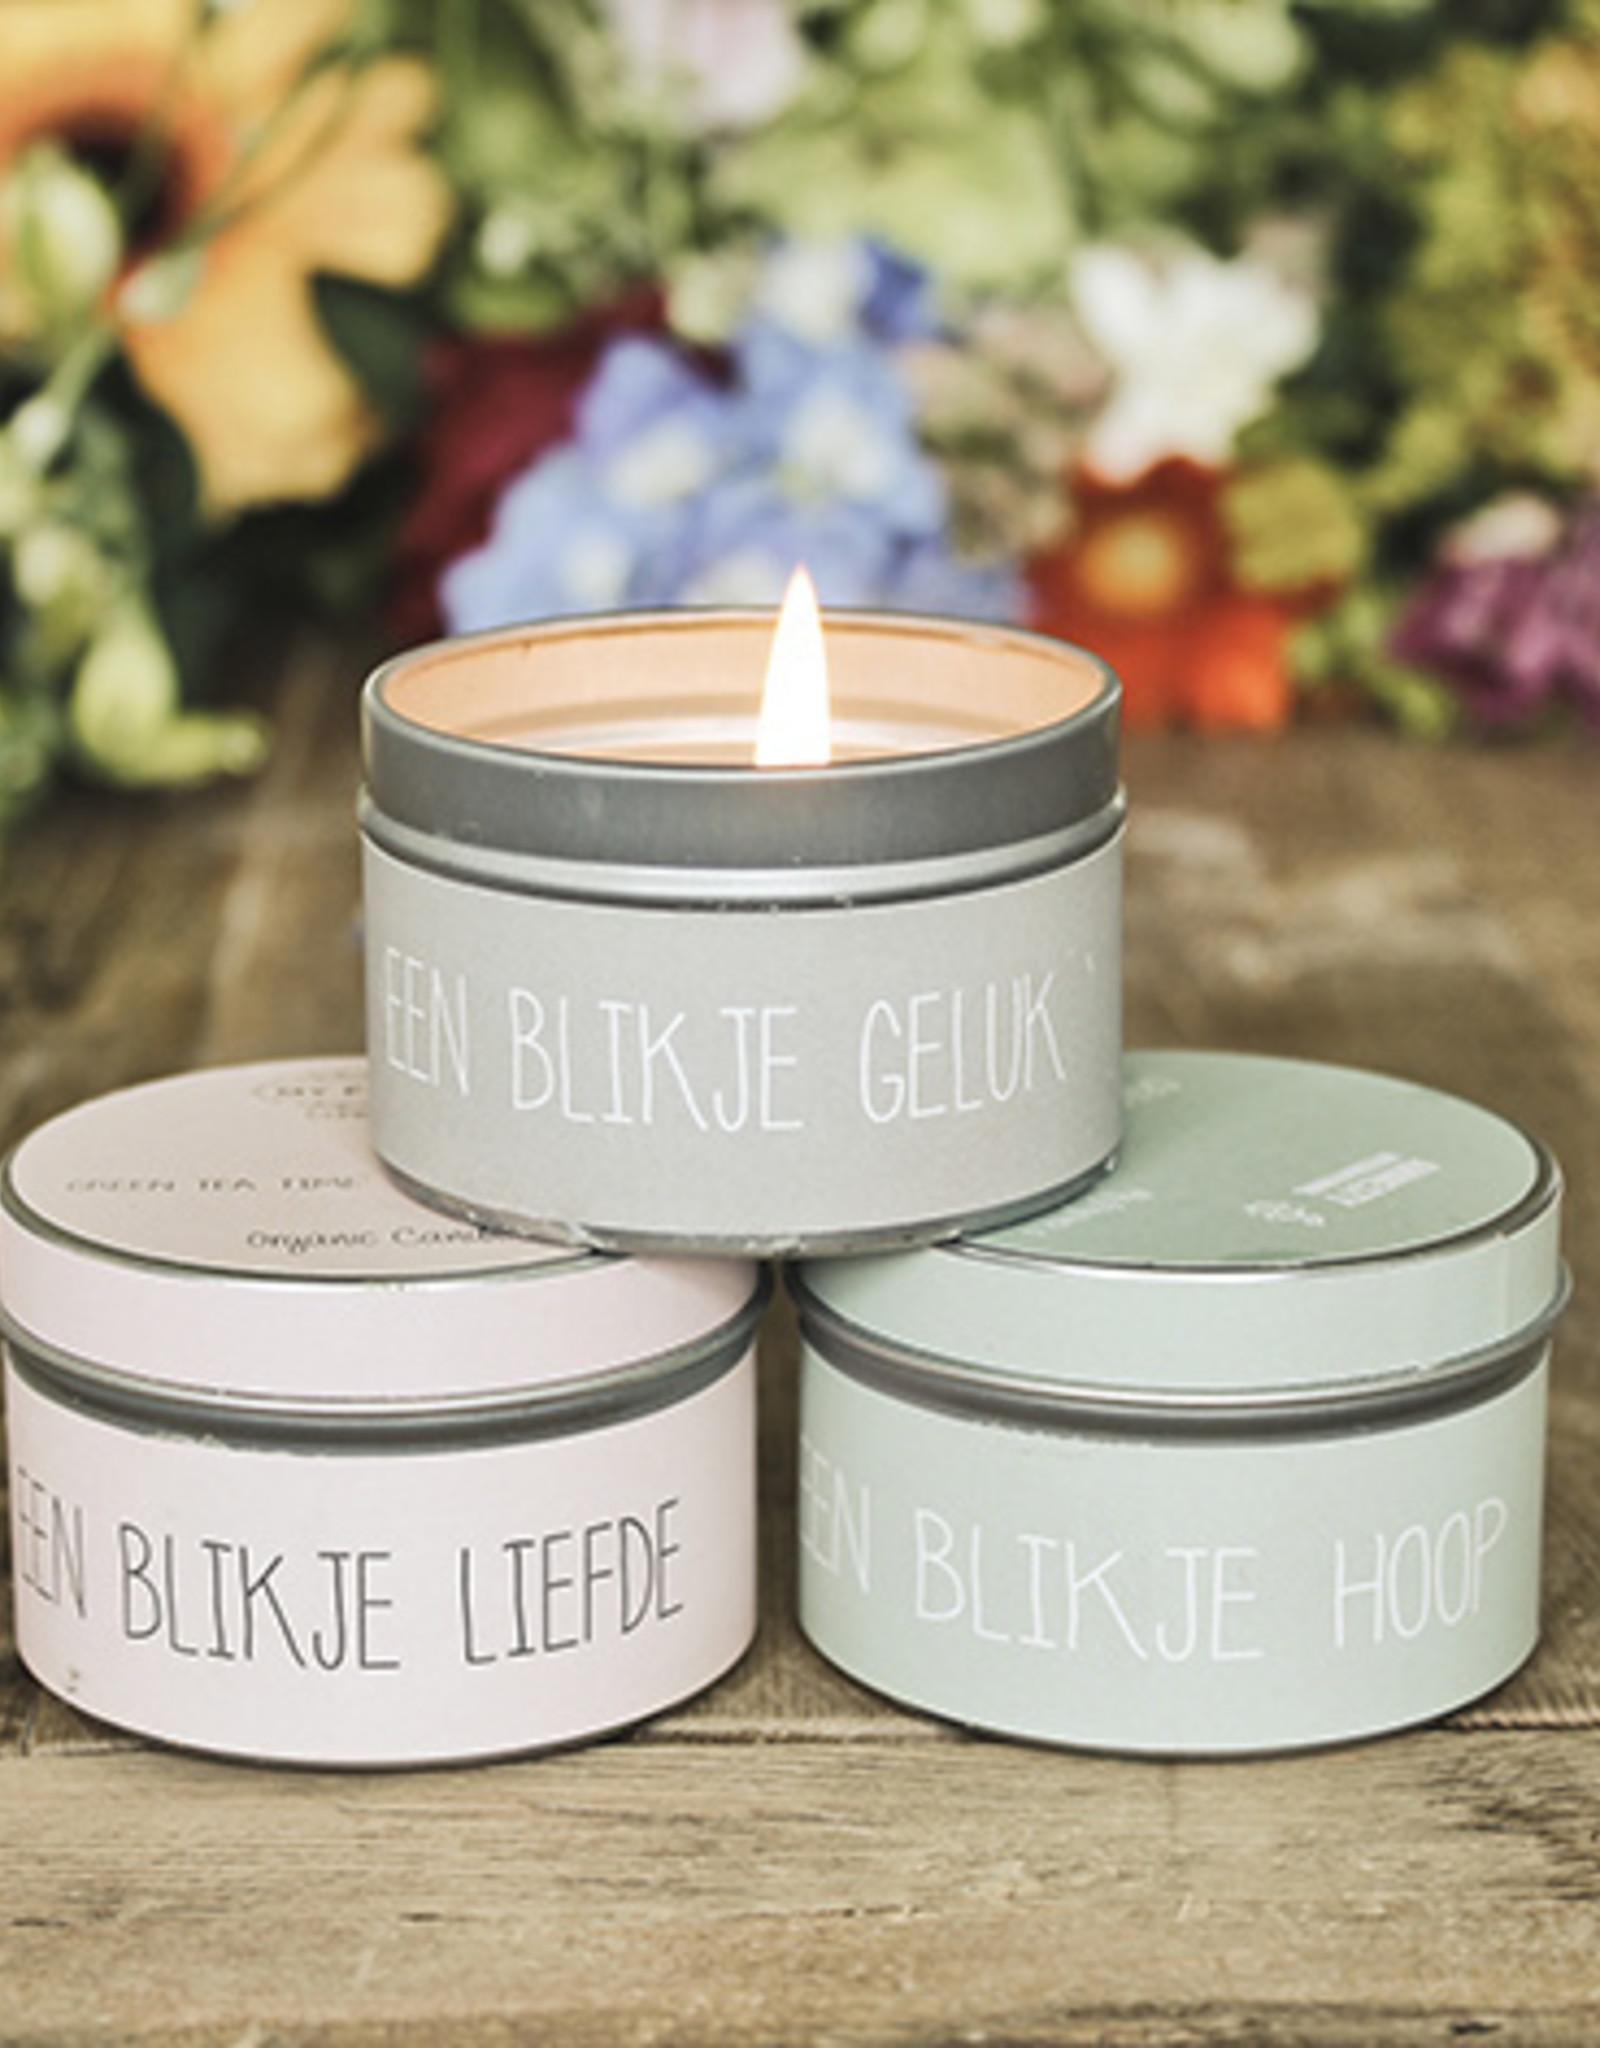 My Flame Lifestyle Geurkaars - EEN BLIKJE GELUK - Geur: FIG'S DELIGHT